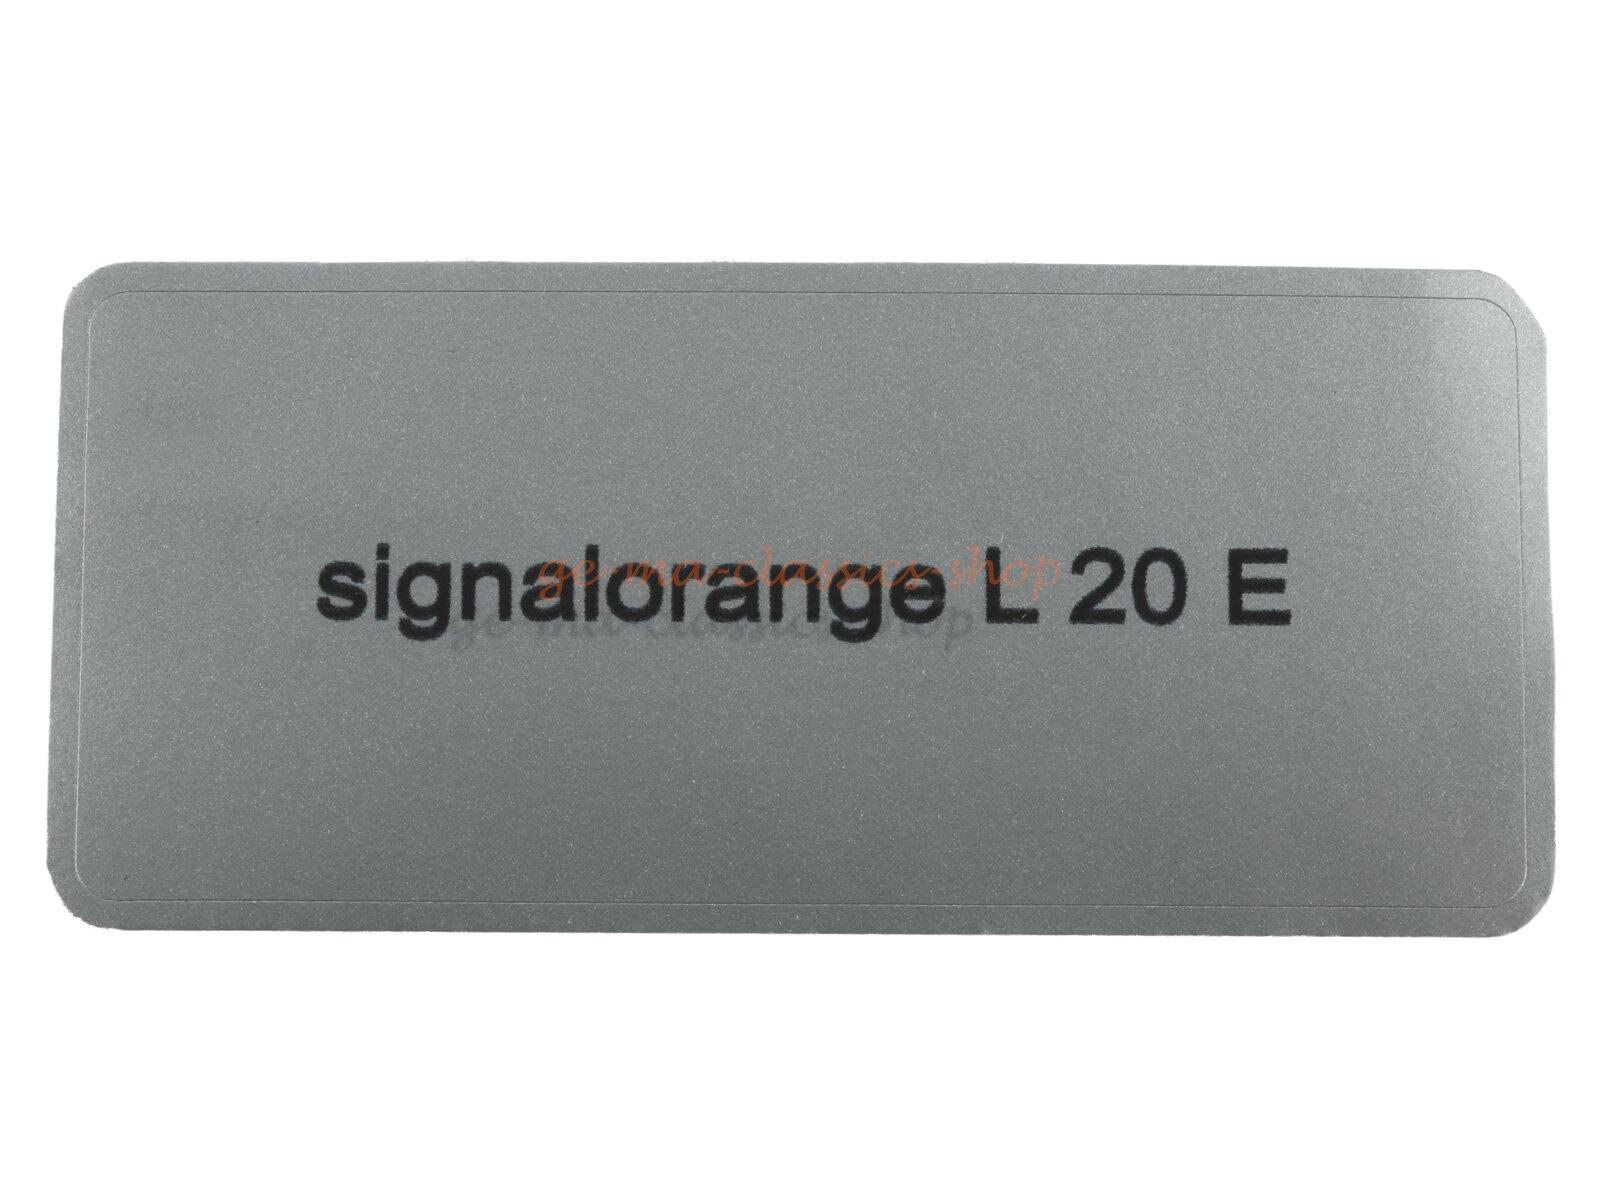 "Aufkleber ""signalorange L 20 E"""